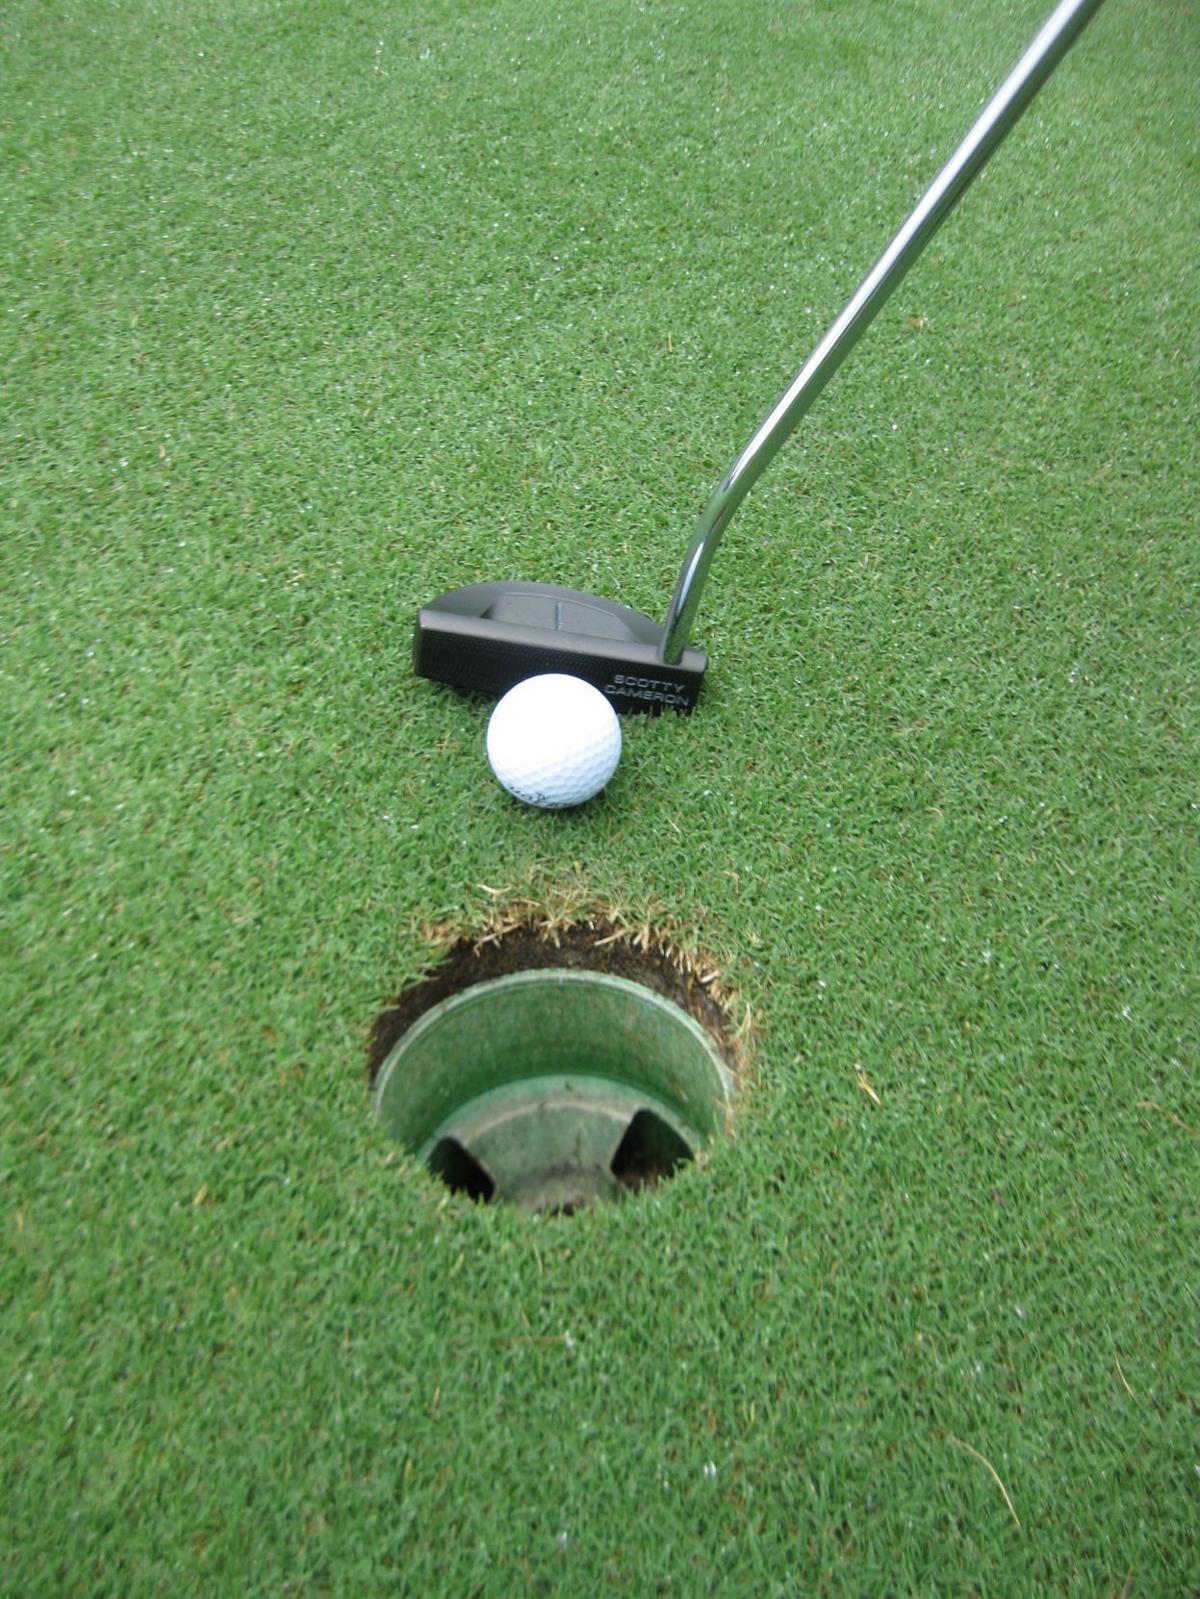 Entry deadline Tuesday for Al Esposito Junior golf championship